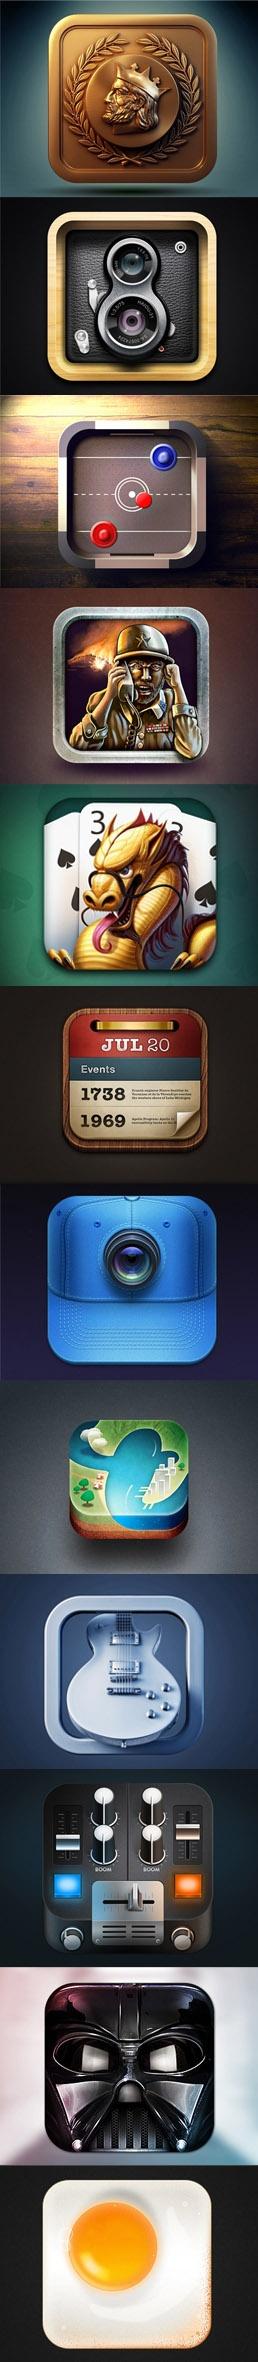 45 Fresh Examples Of iOS App Icon Designs graphicdesignjunc…